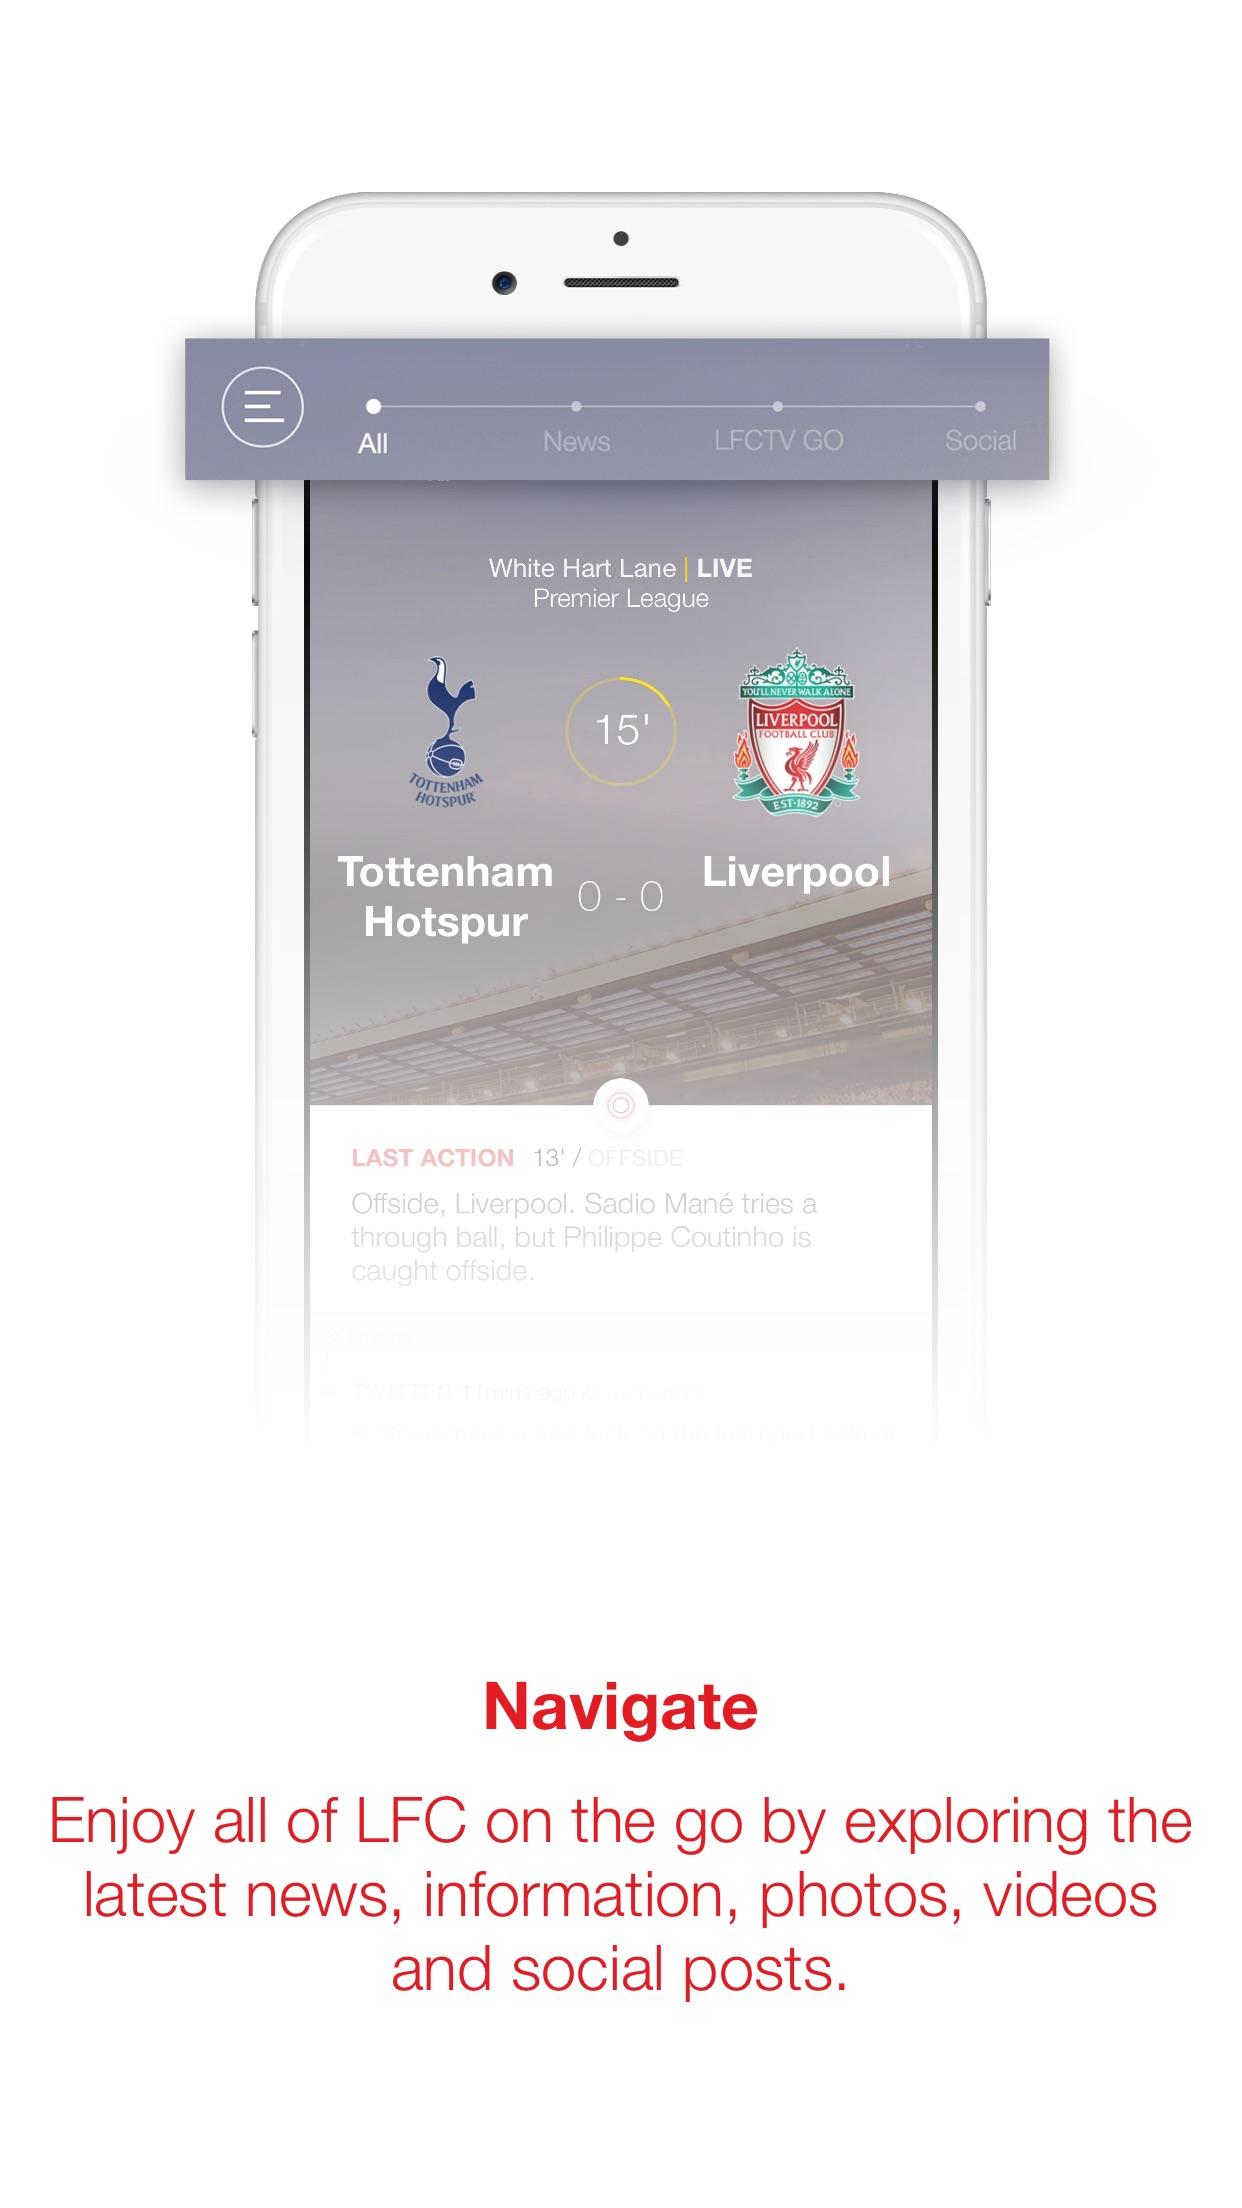 LFC Official App Screenshot